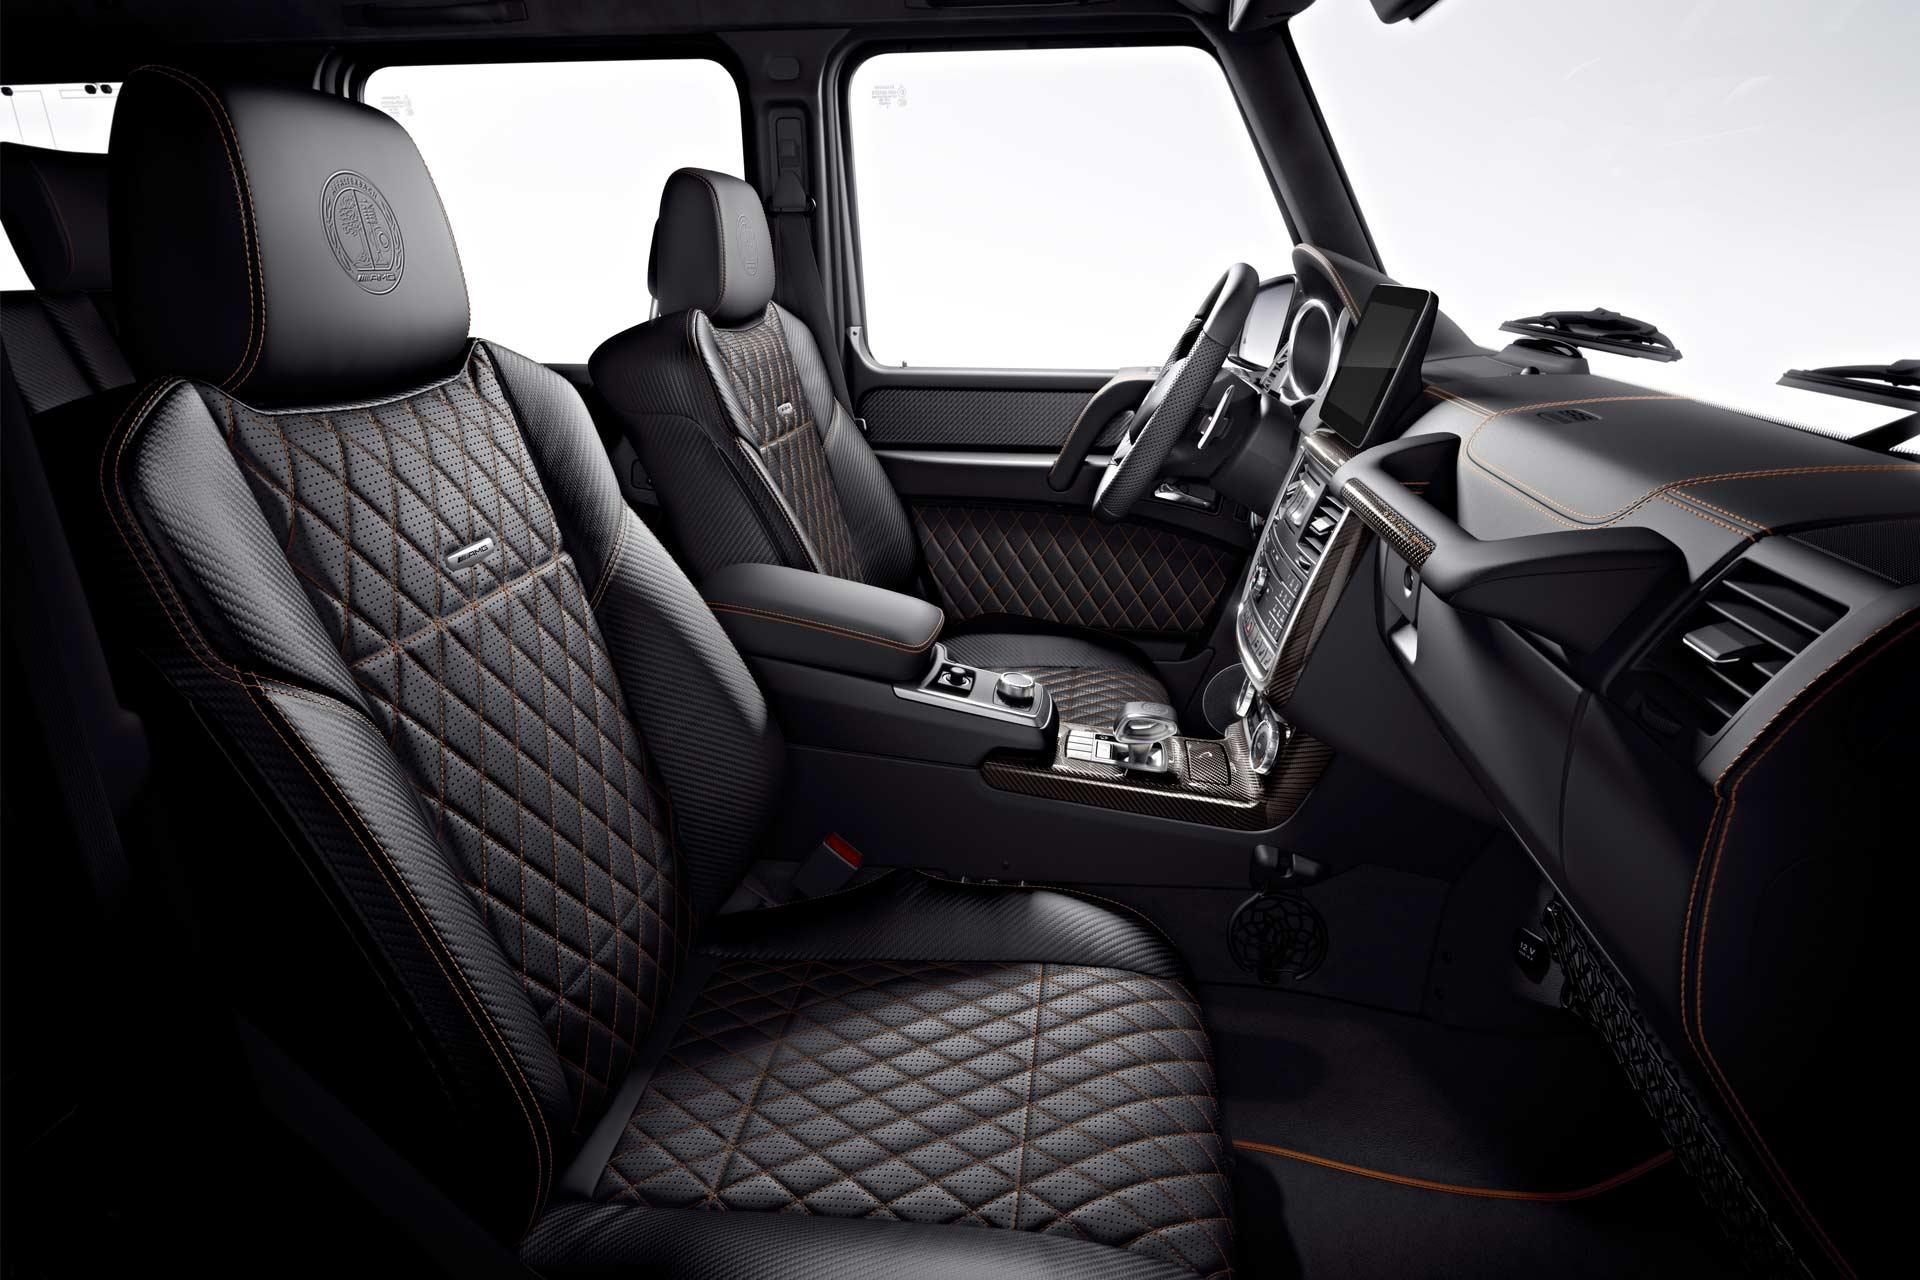 Mercedes-AMG-G-65-Final-Edition-Interior